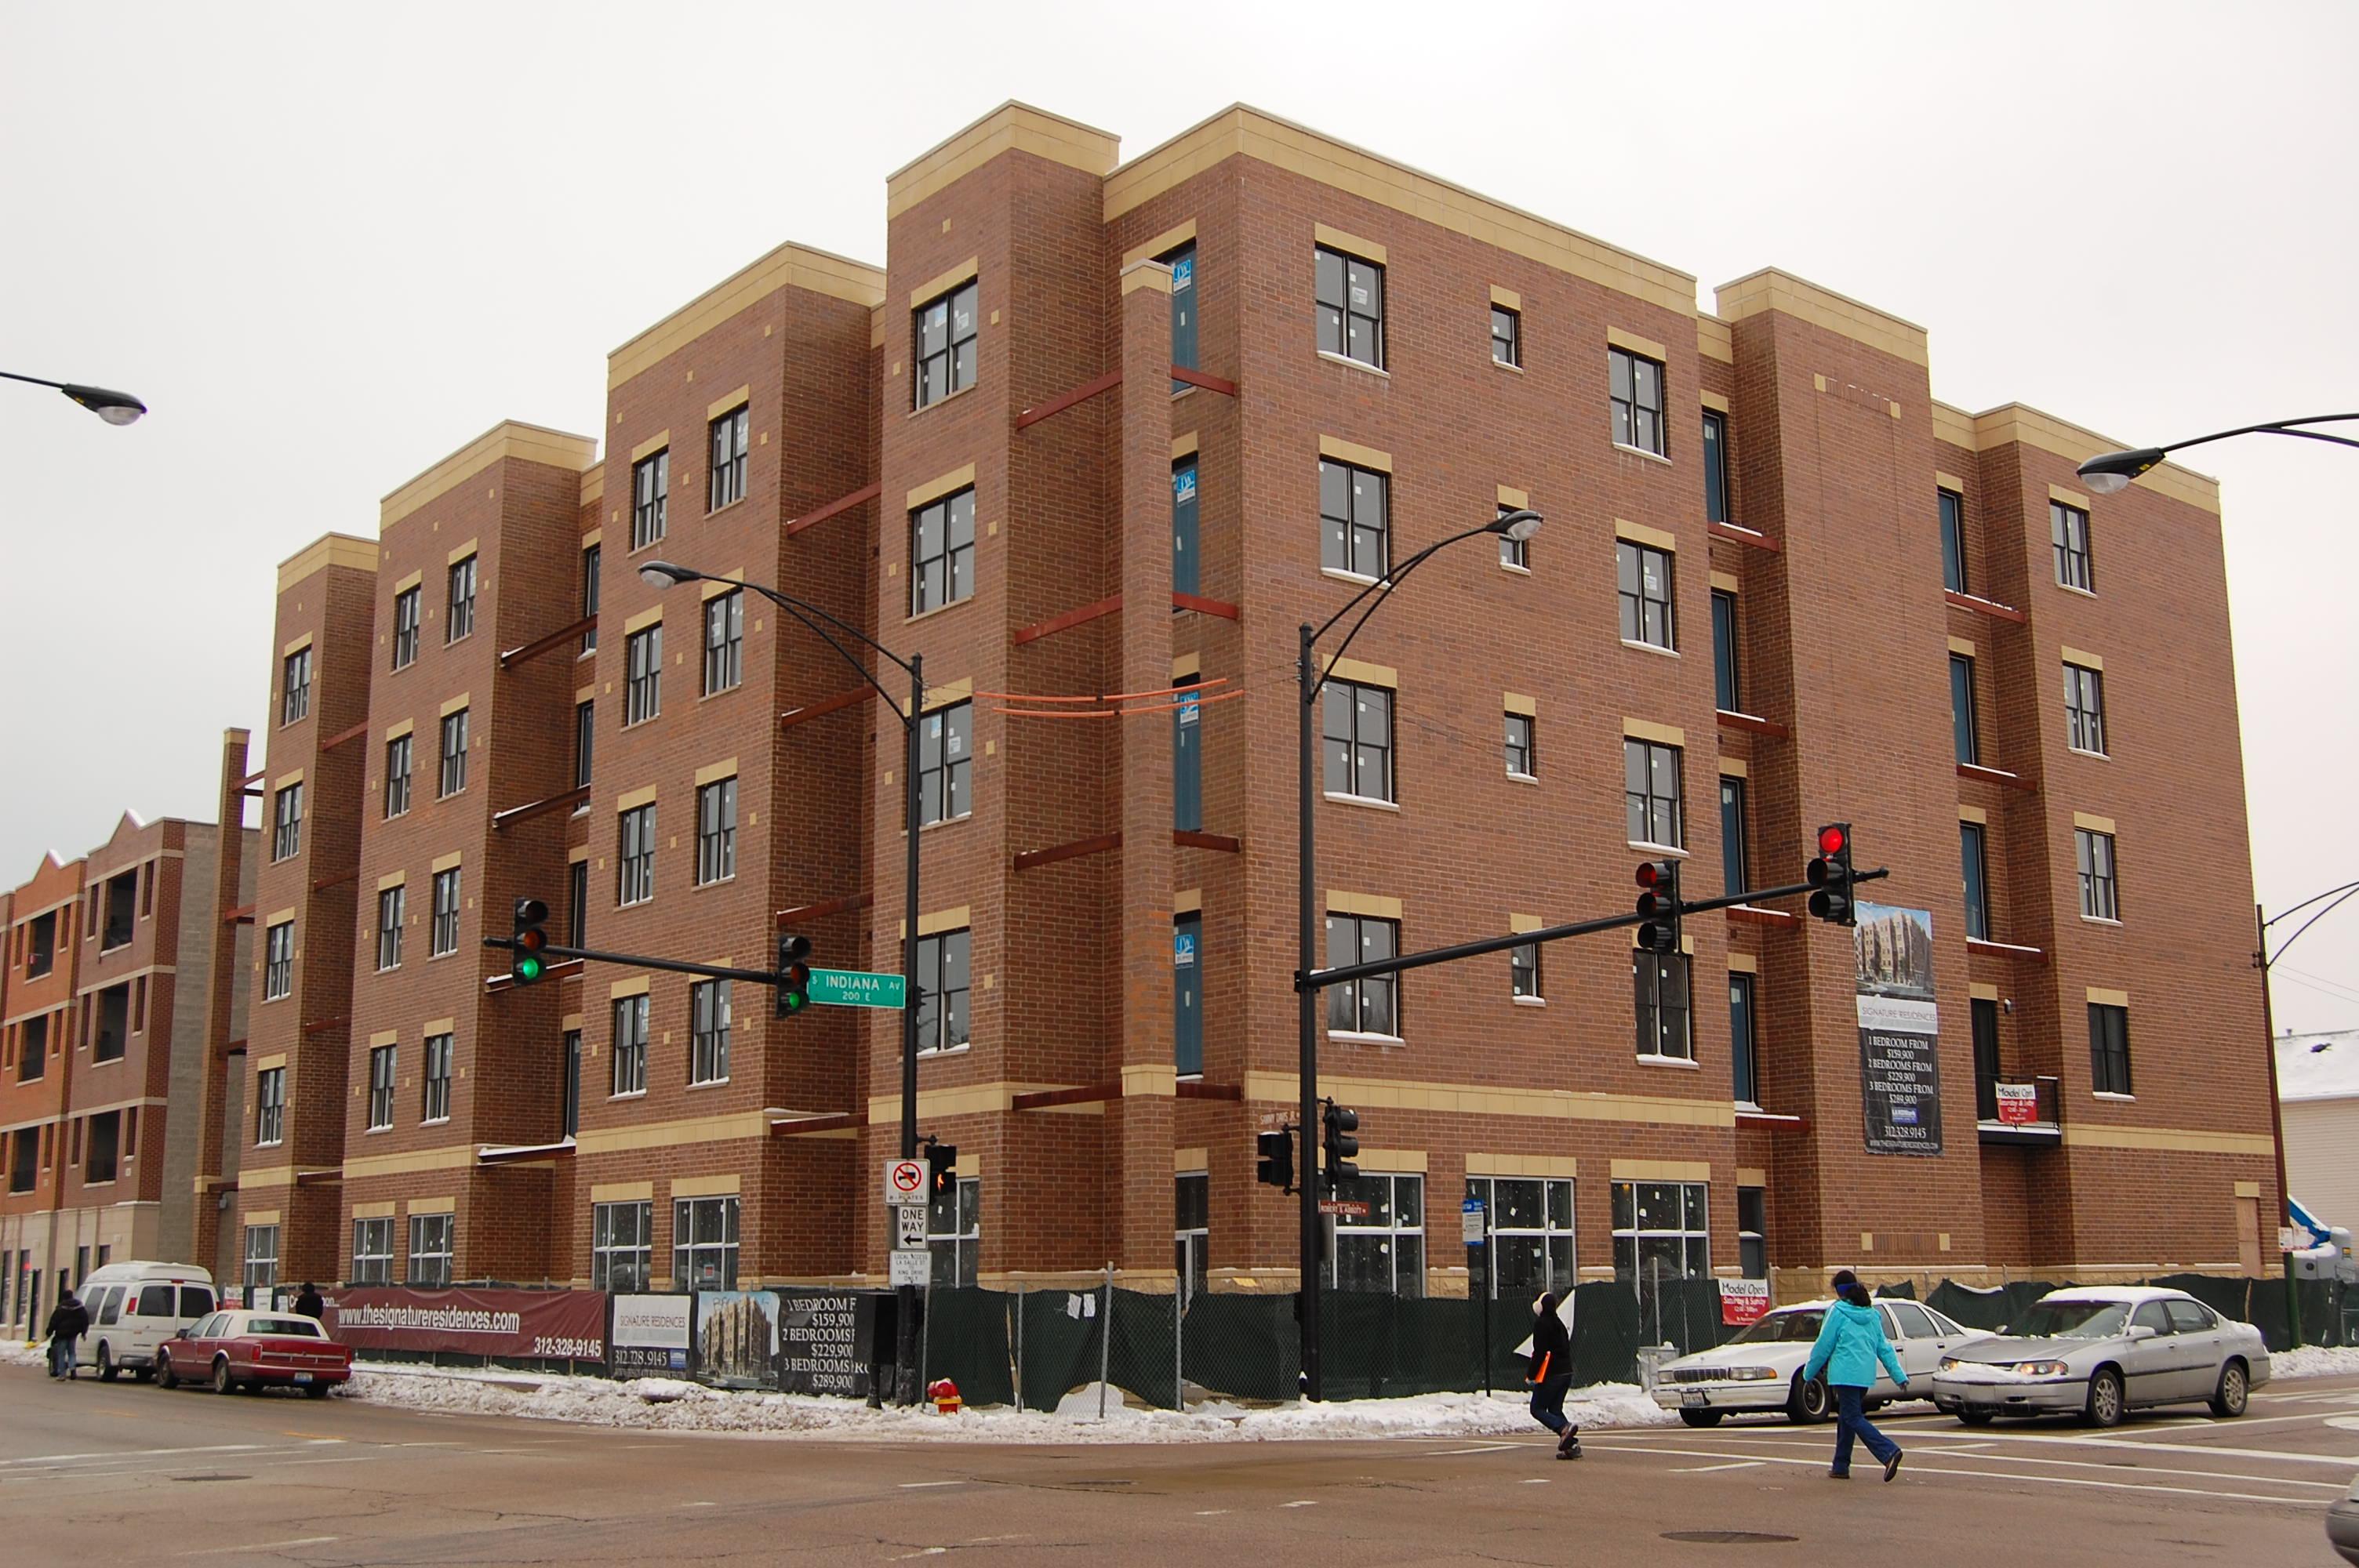 New homes roundup bronzeville condos yochicago - 2 bedroom apartments in bronzeville chicago ...